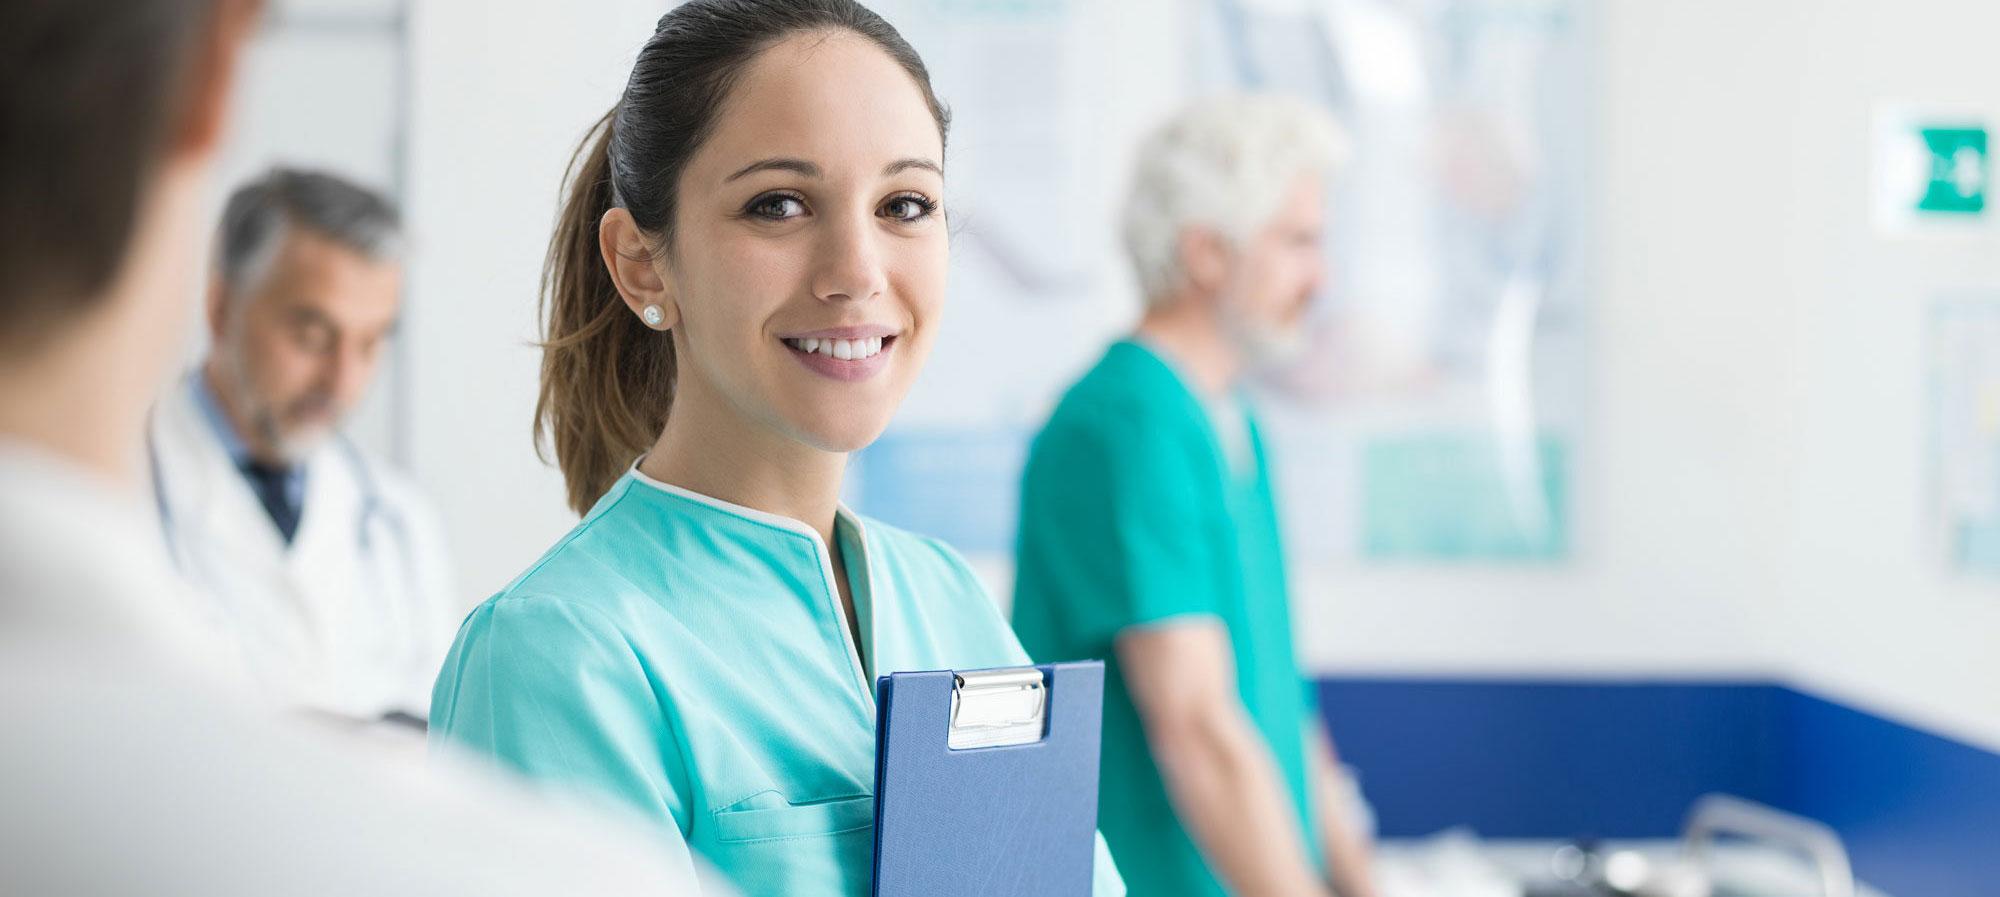 EKG / Cardiac Monitor Technician - Larock Healthcare Academy